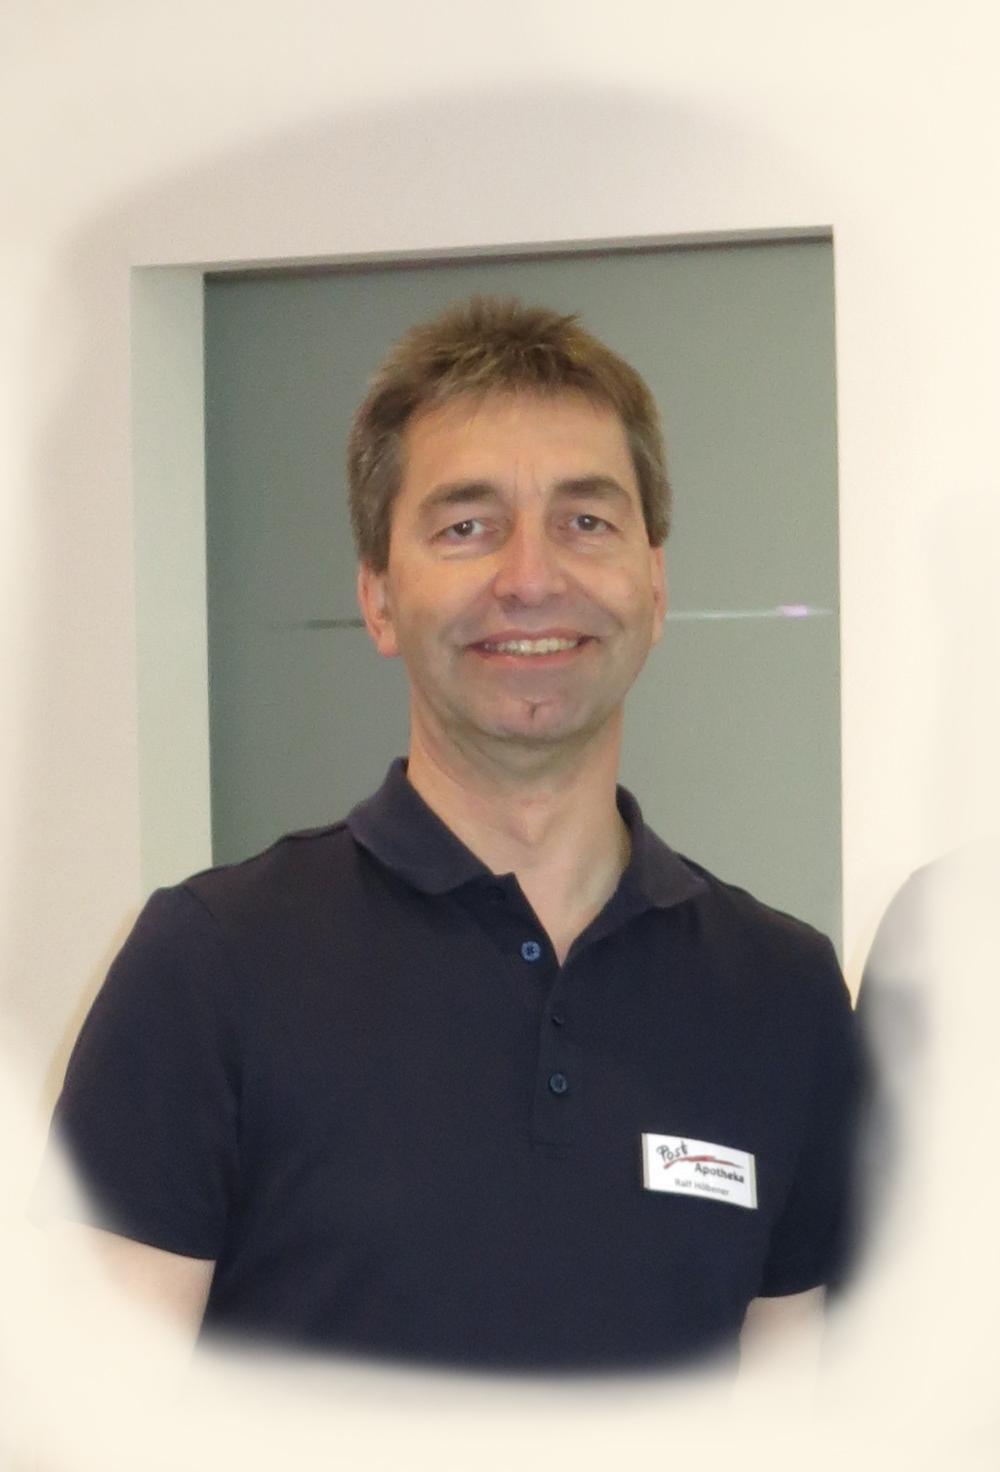 Porträtfoto von Ralf Höbener